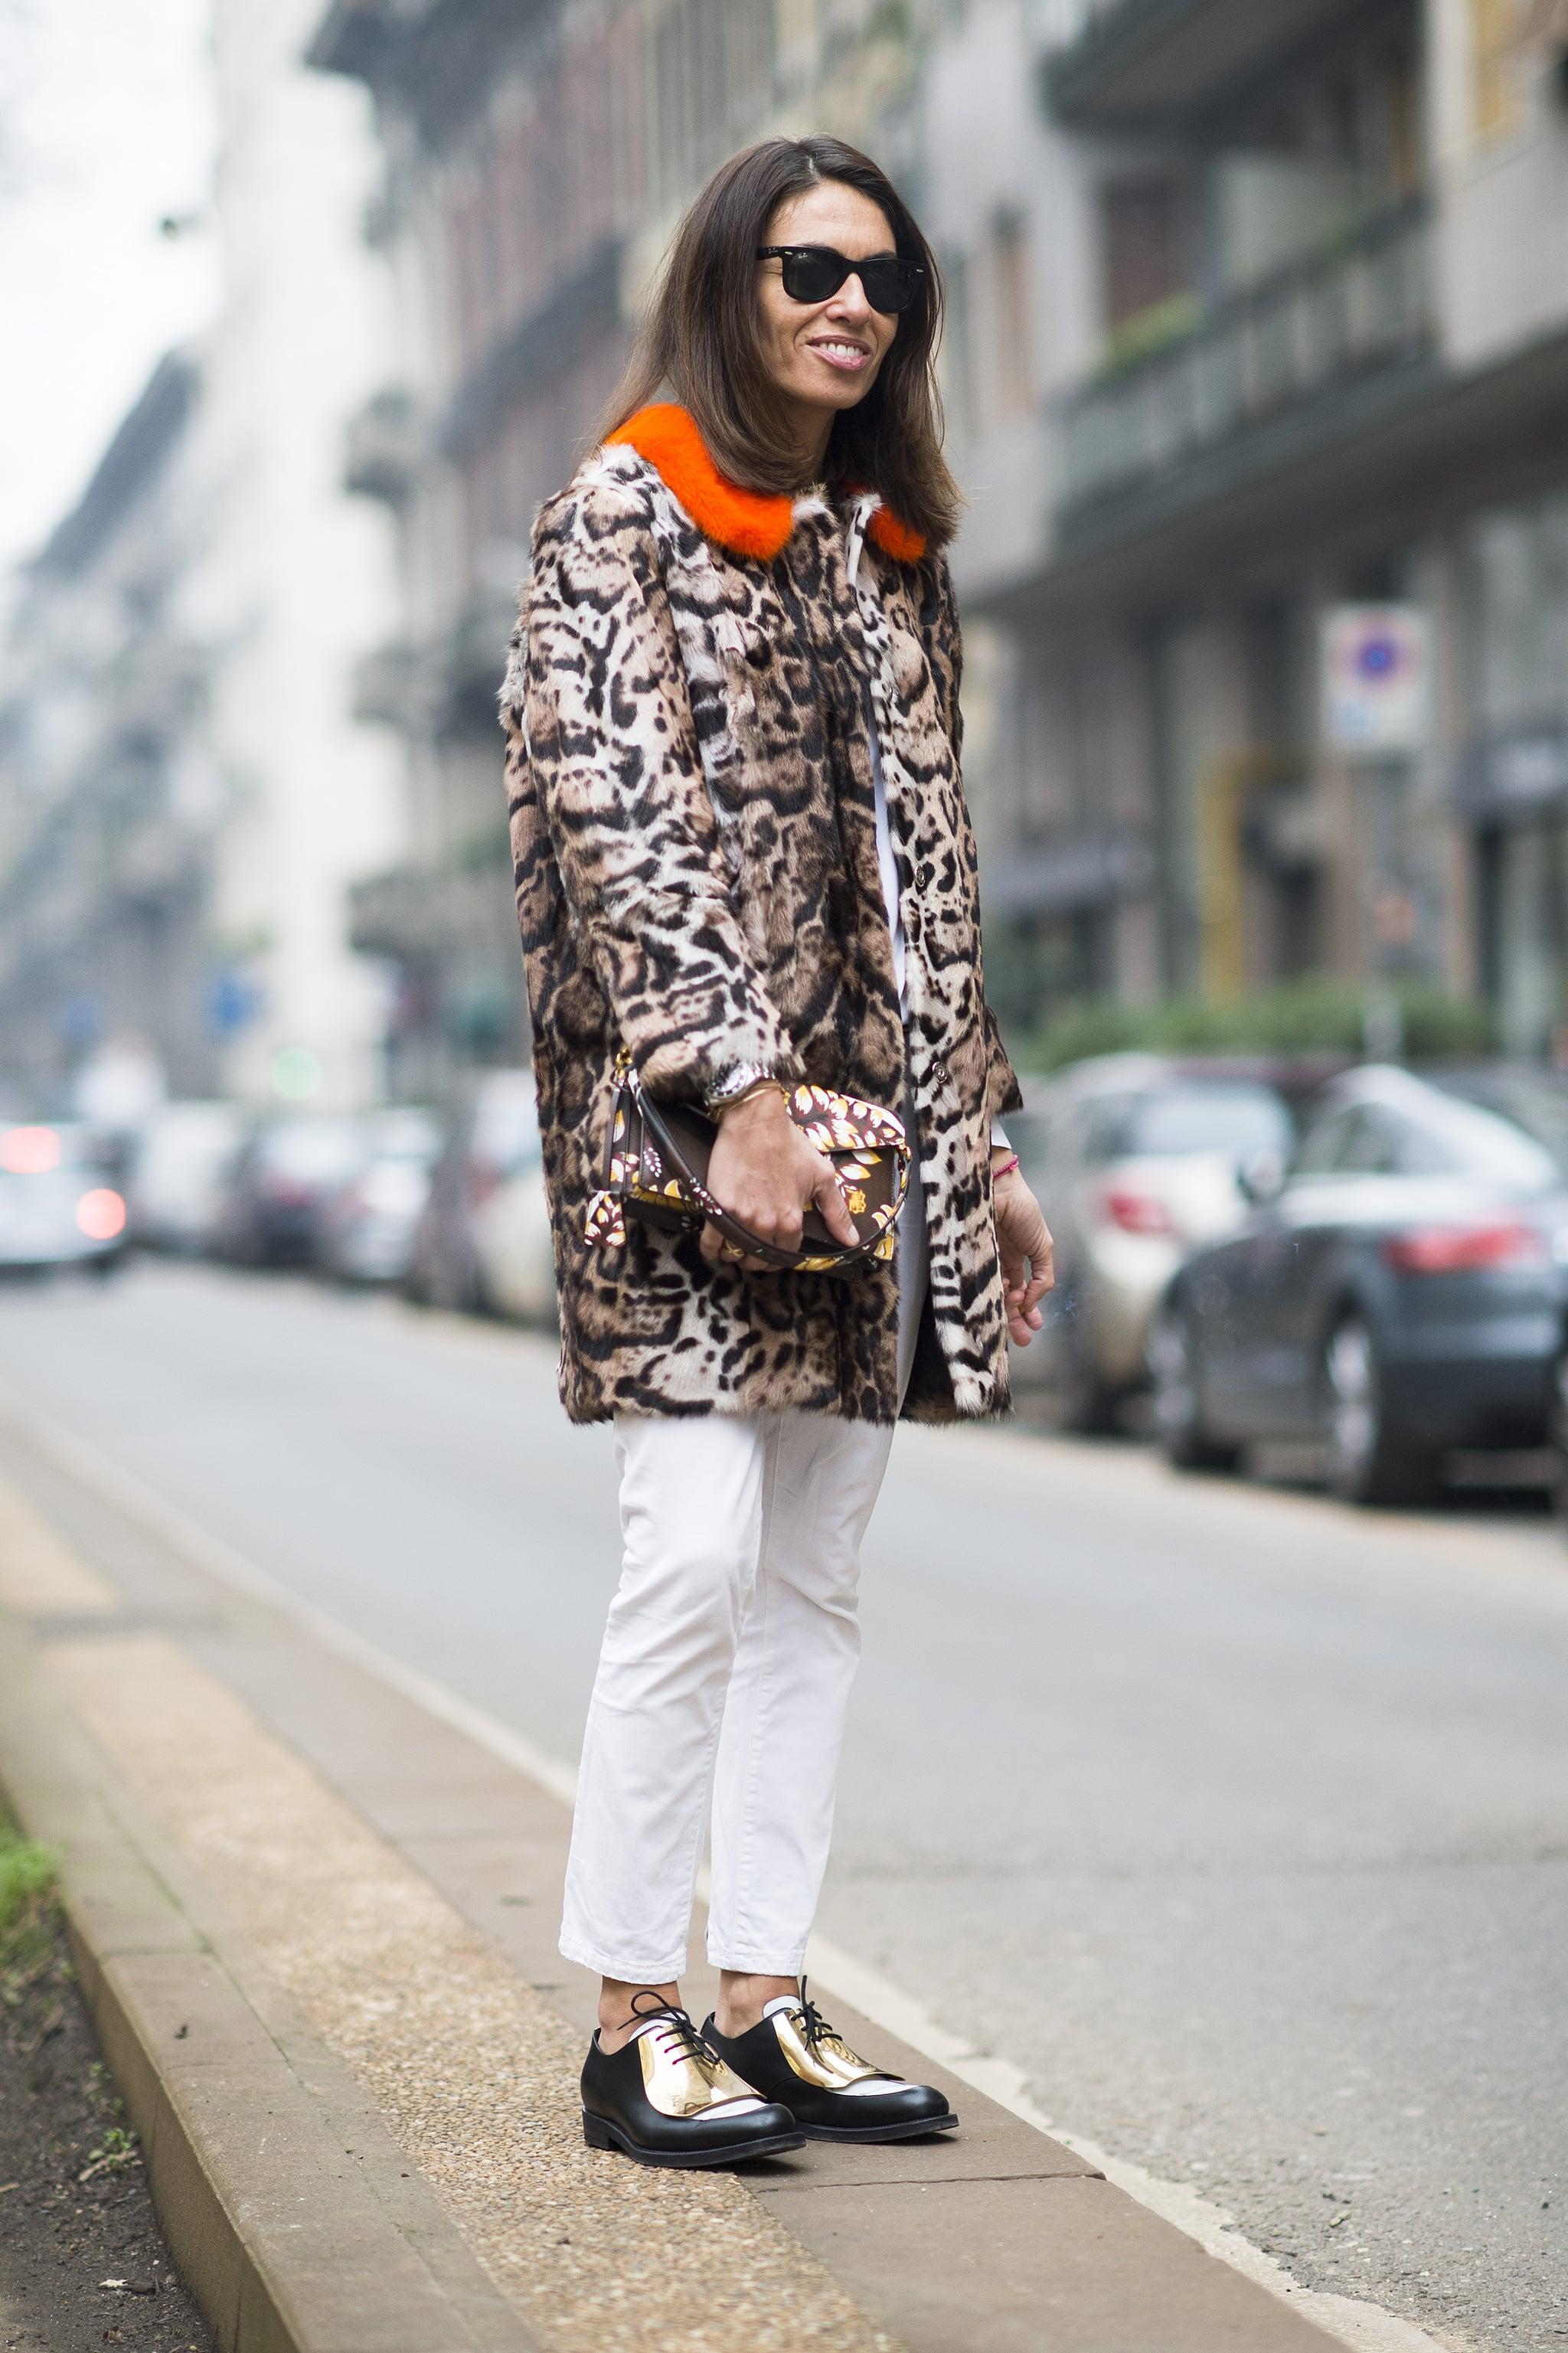 Livened up with leopard print — and some metallic kicks.  Source: Le 21ème | Adam Katz Sinding